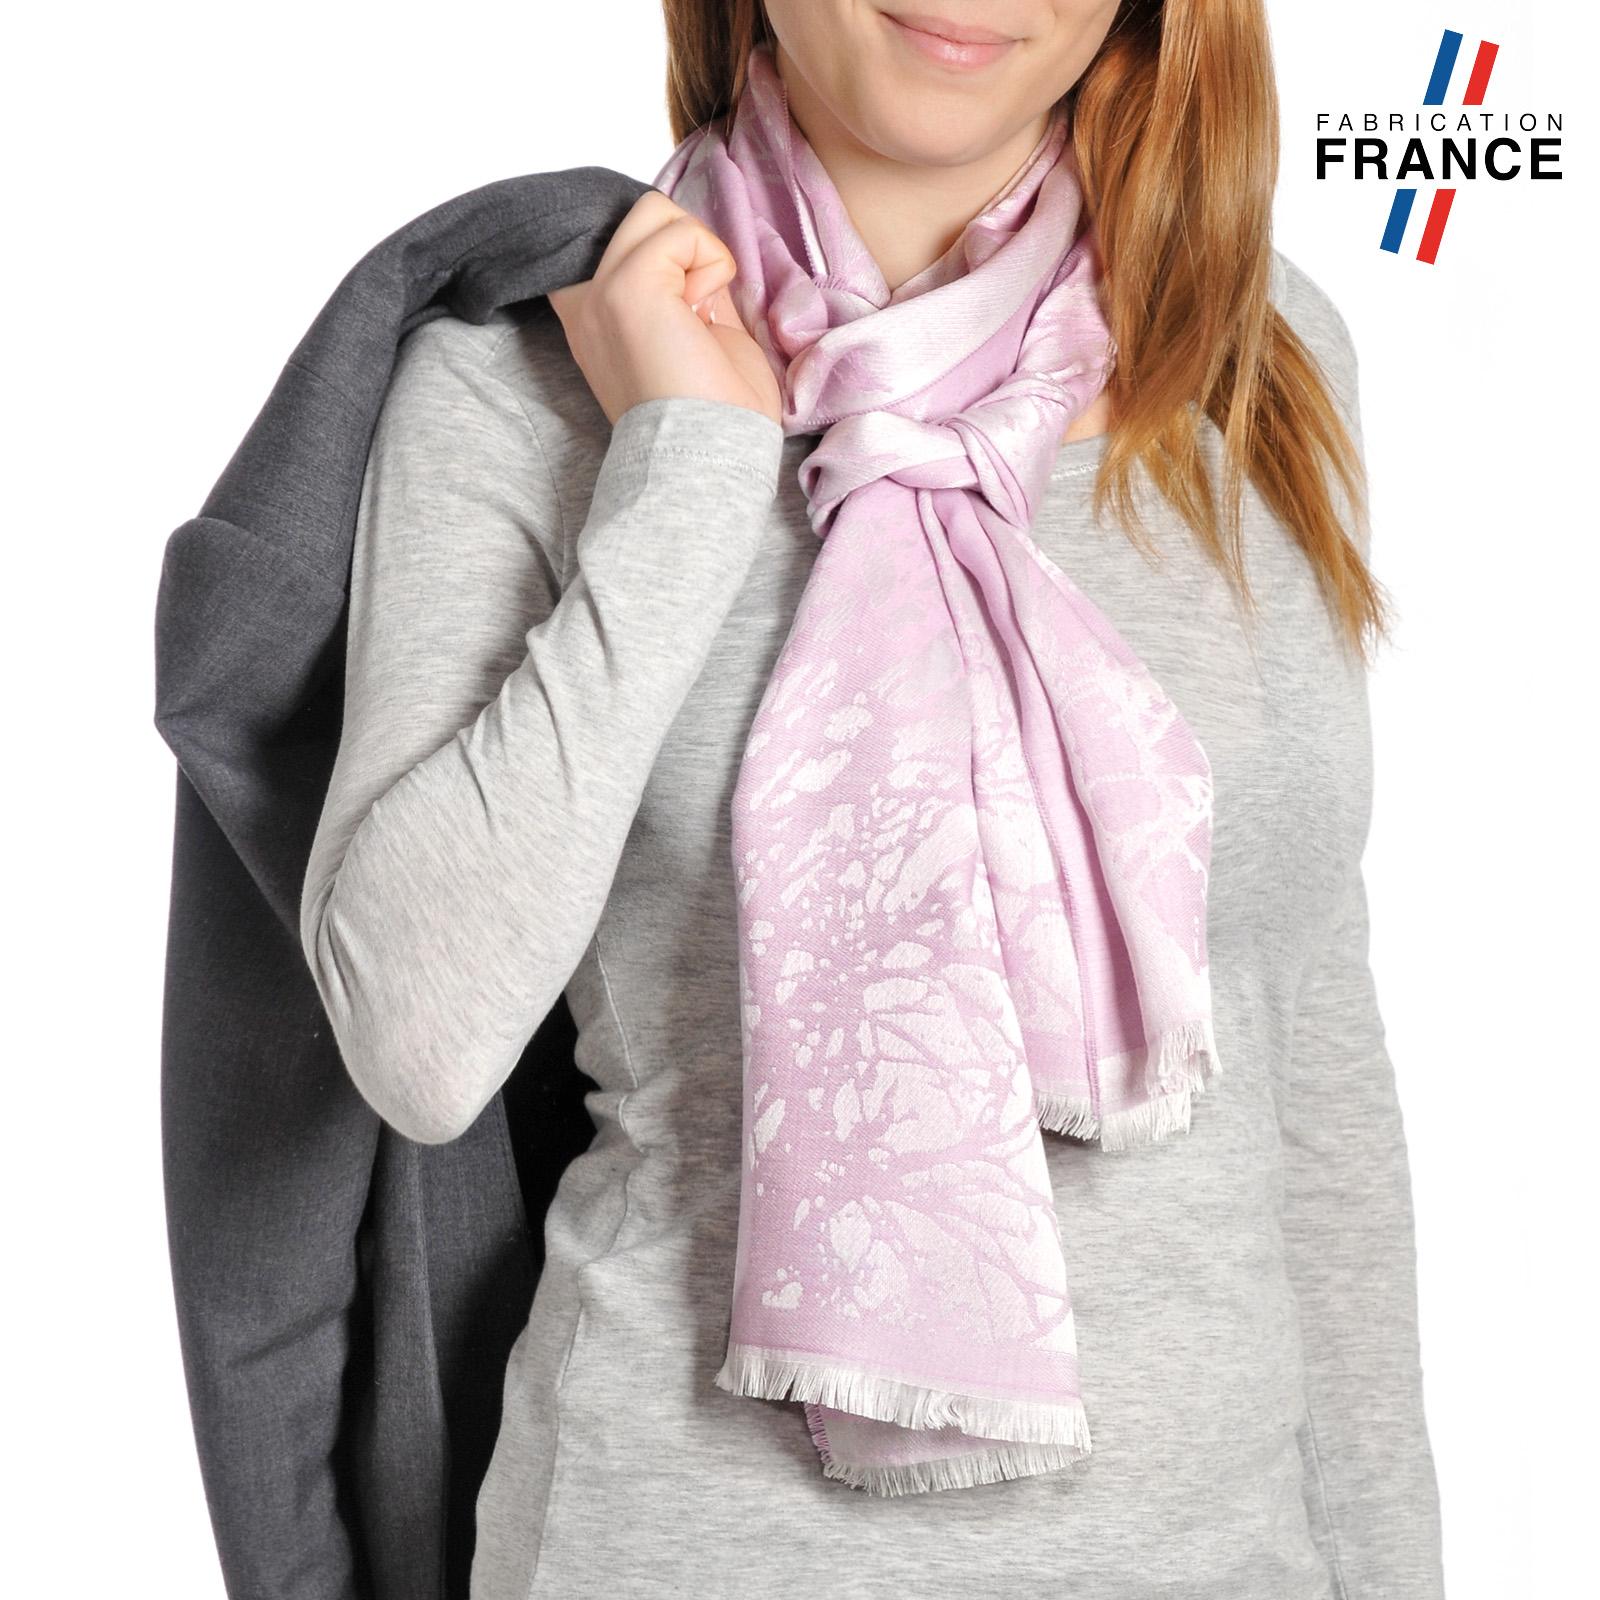 AT-04183-VF16-P-LB_FR-echarpe-ete-parme-qualicoq-fabrication-france